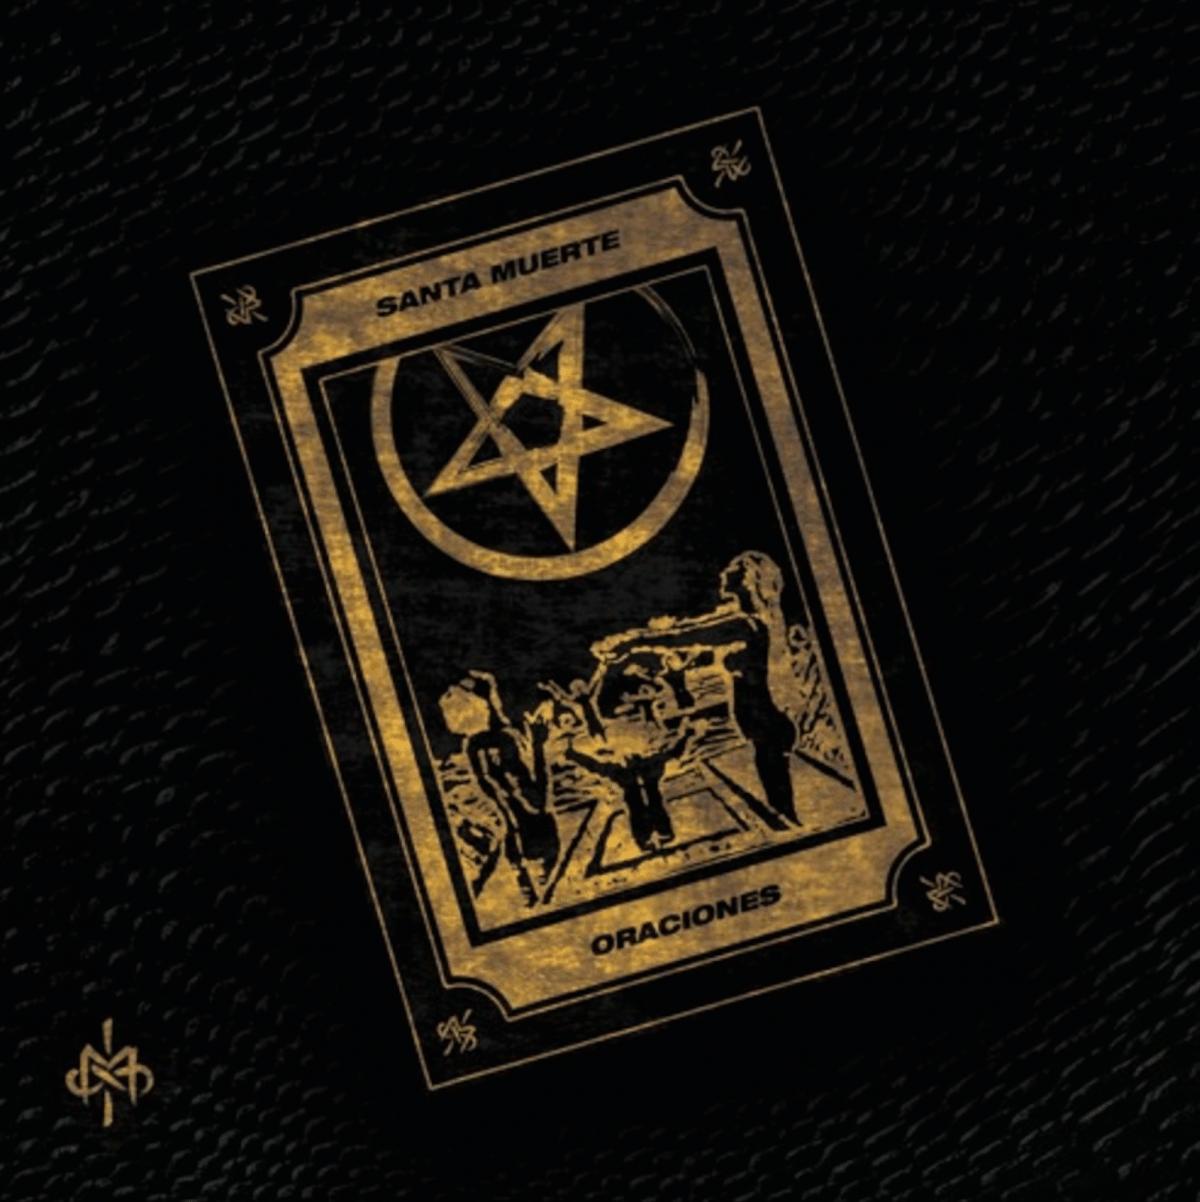 Santa Muerte's 'Oraciones' EP is a Prayer to the Club Reggaeton Gods